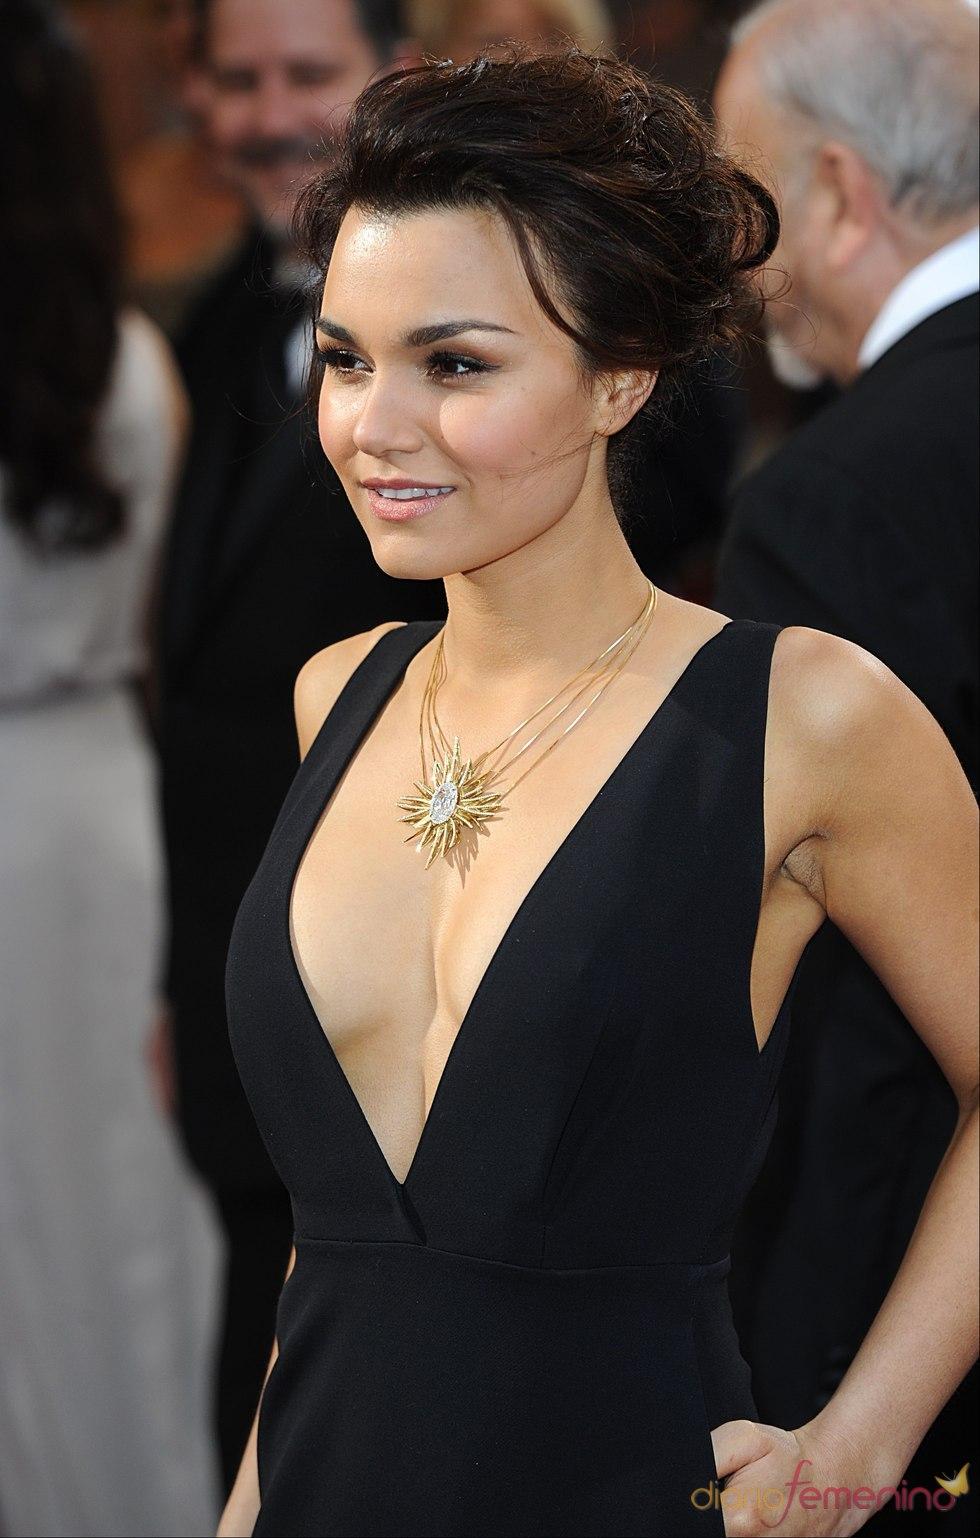 Samantha Barks en los Oscars 2013